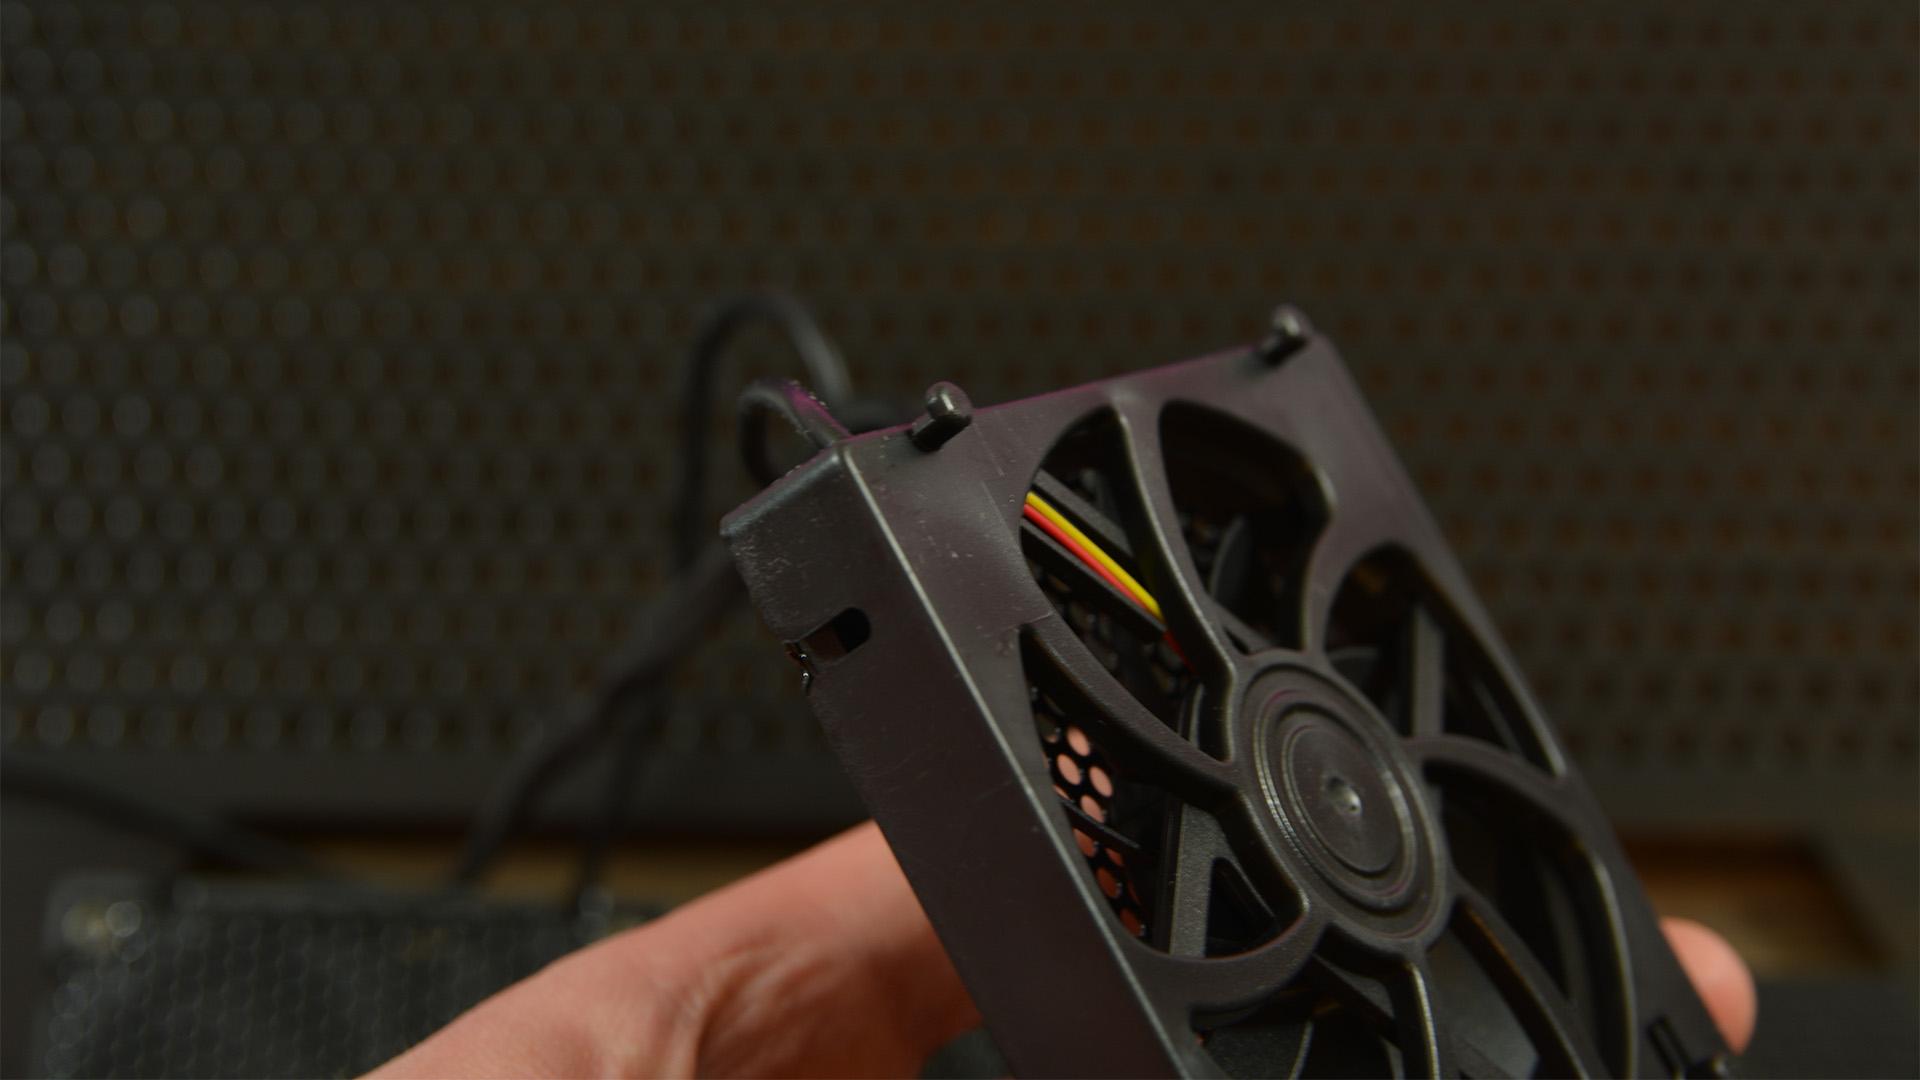 Cooler Master NotePal U3 Plus fan clips